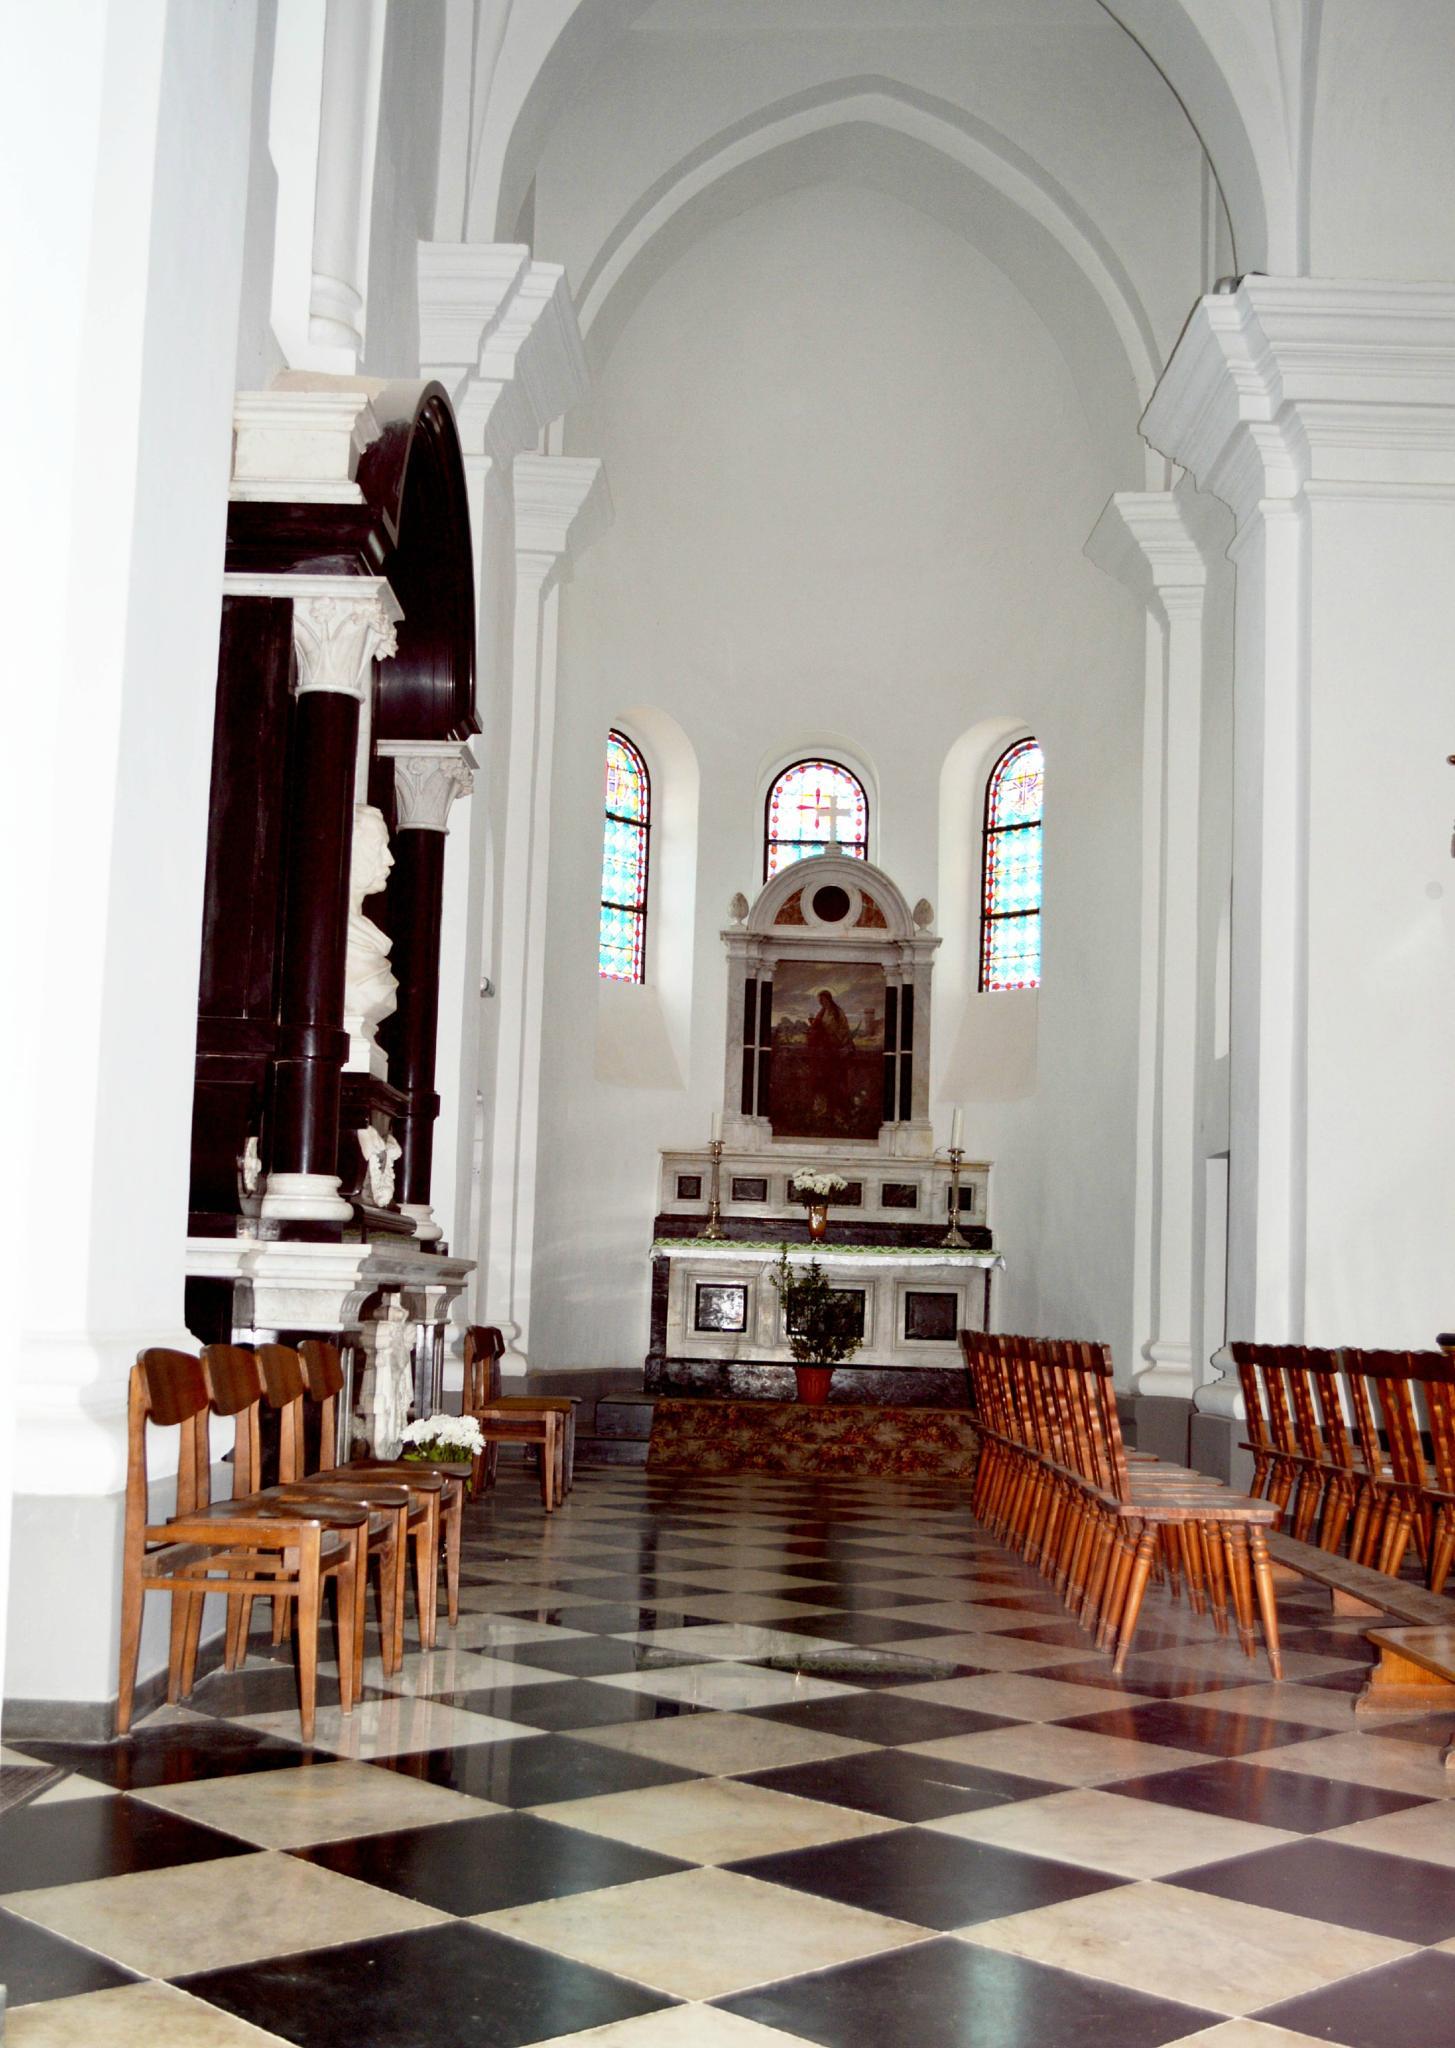 Inside Rietava's church 2 by Moni Mon ( M&M Fotografija )